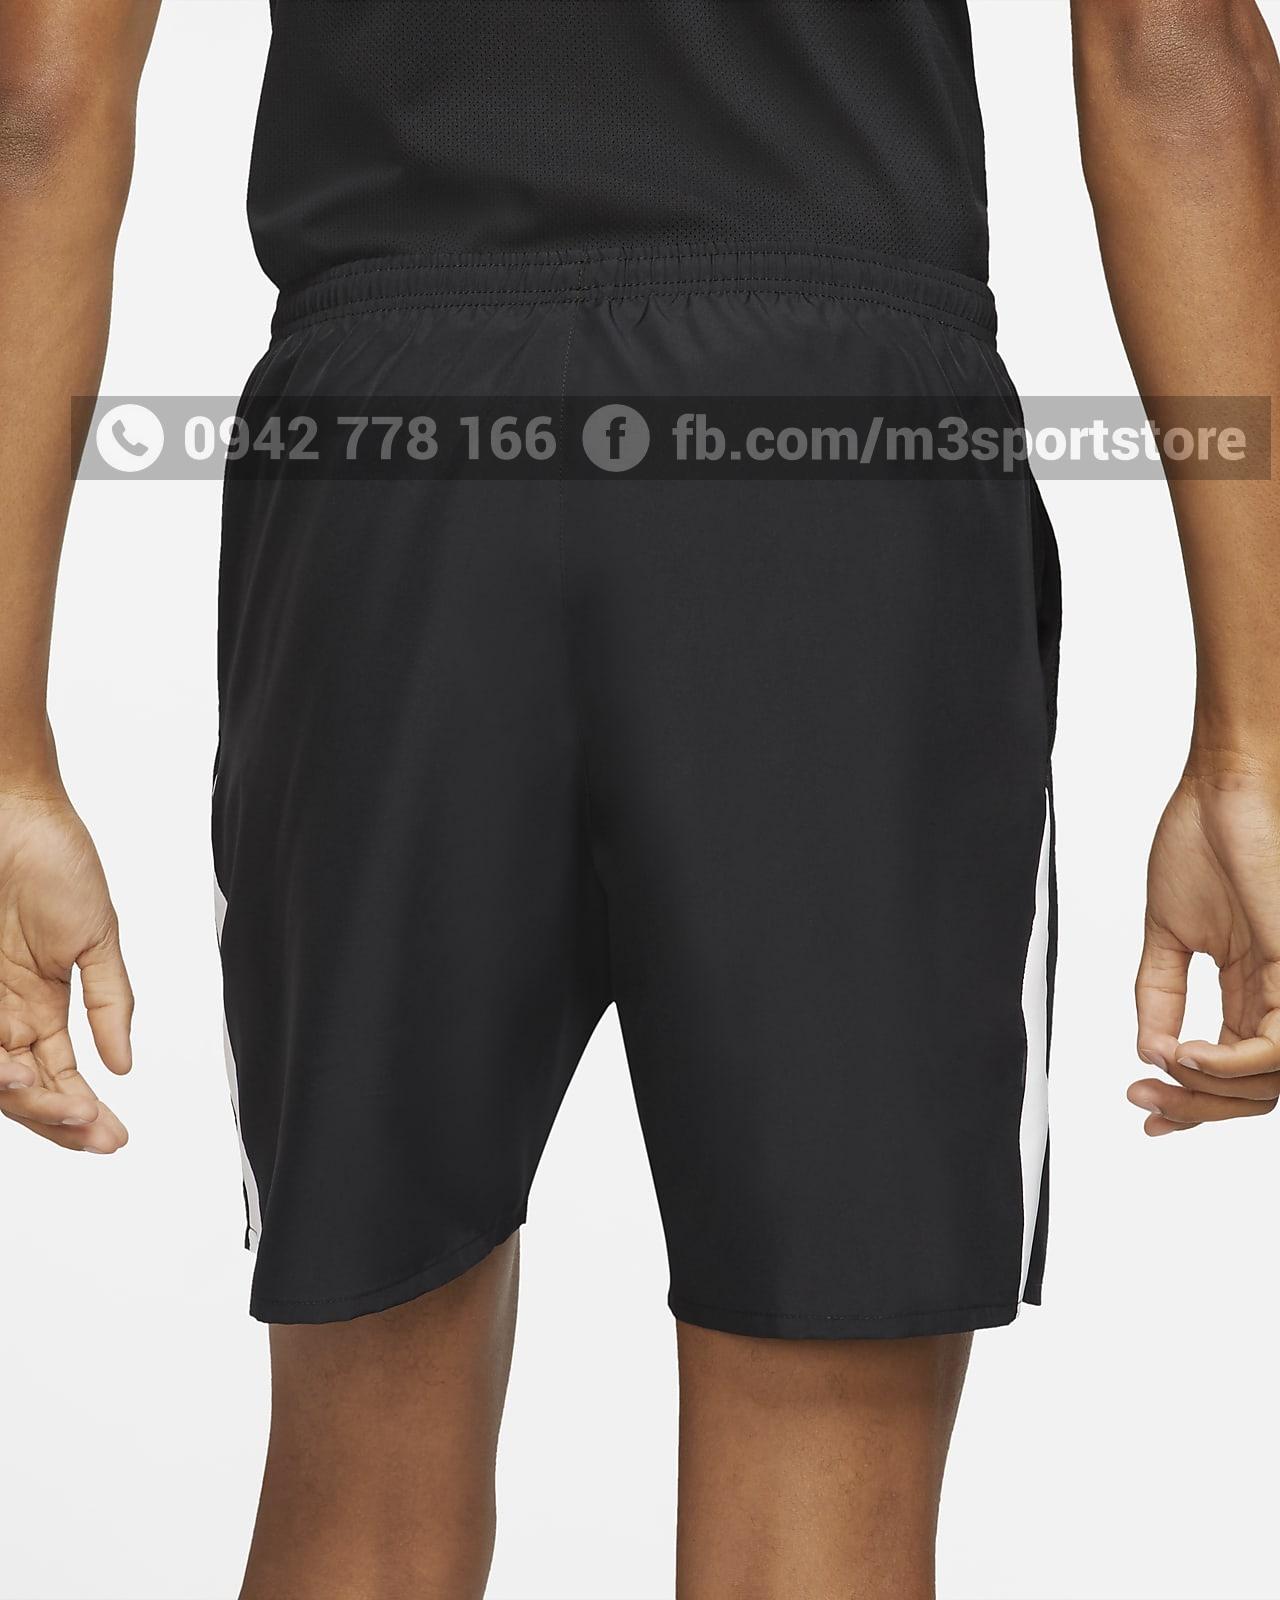 Quần short thể thao nam running Nike Wild Run DA0170-010